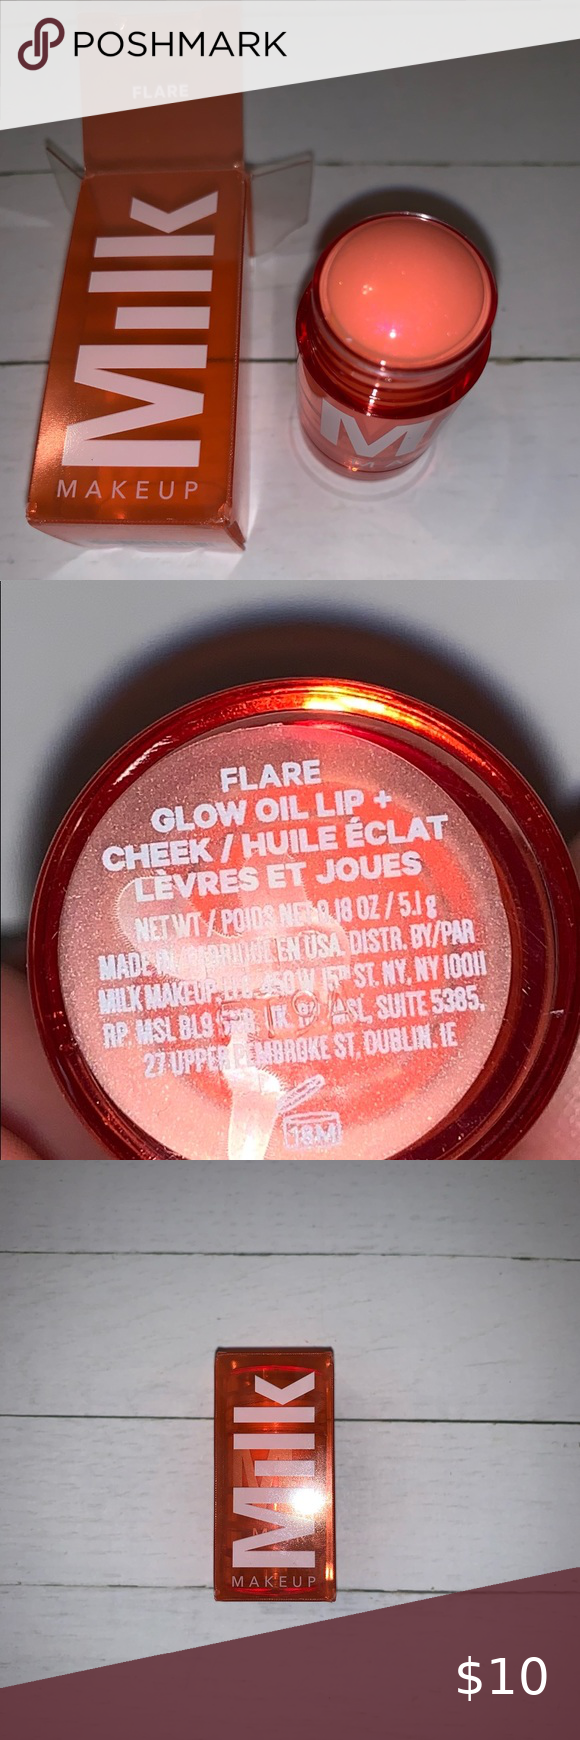 Milk make up Glow oil lip + cheek. in 2020 Milk makeup